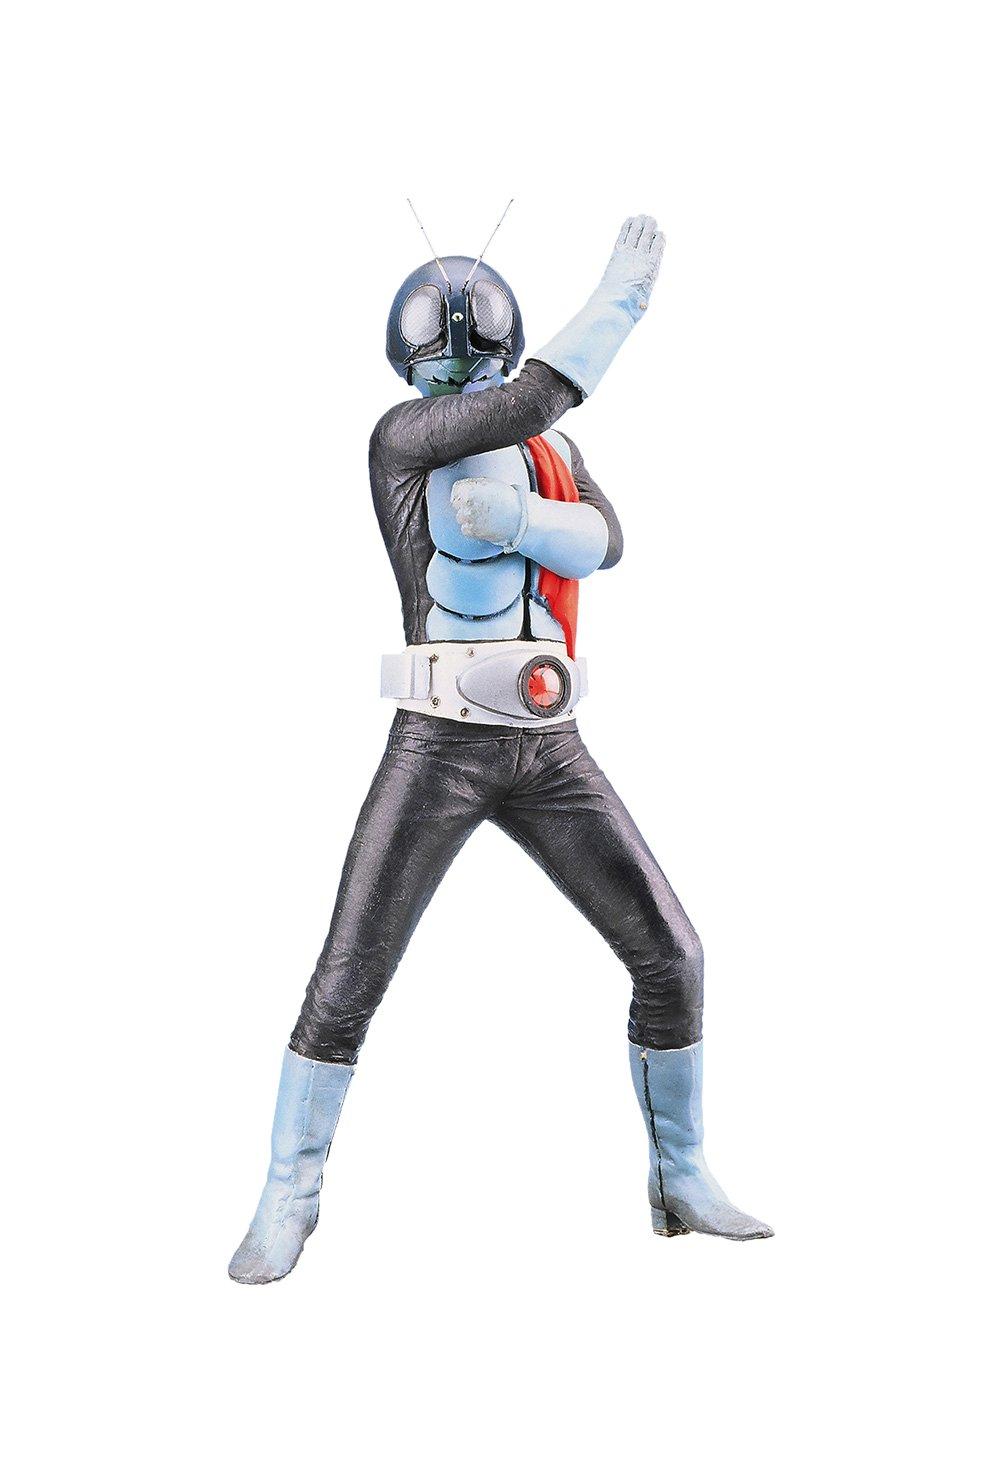 Superheroe plaestico blando coleccioen kit modelo Takeshi Hongo aproximadamente 205 mm de PVC fabricadas con kit de montaje sin pintar